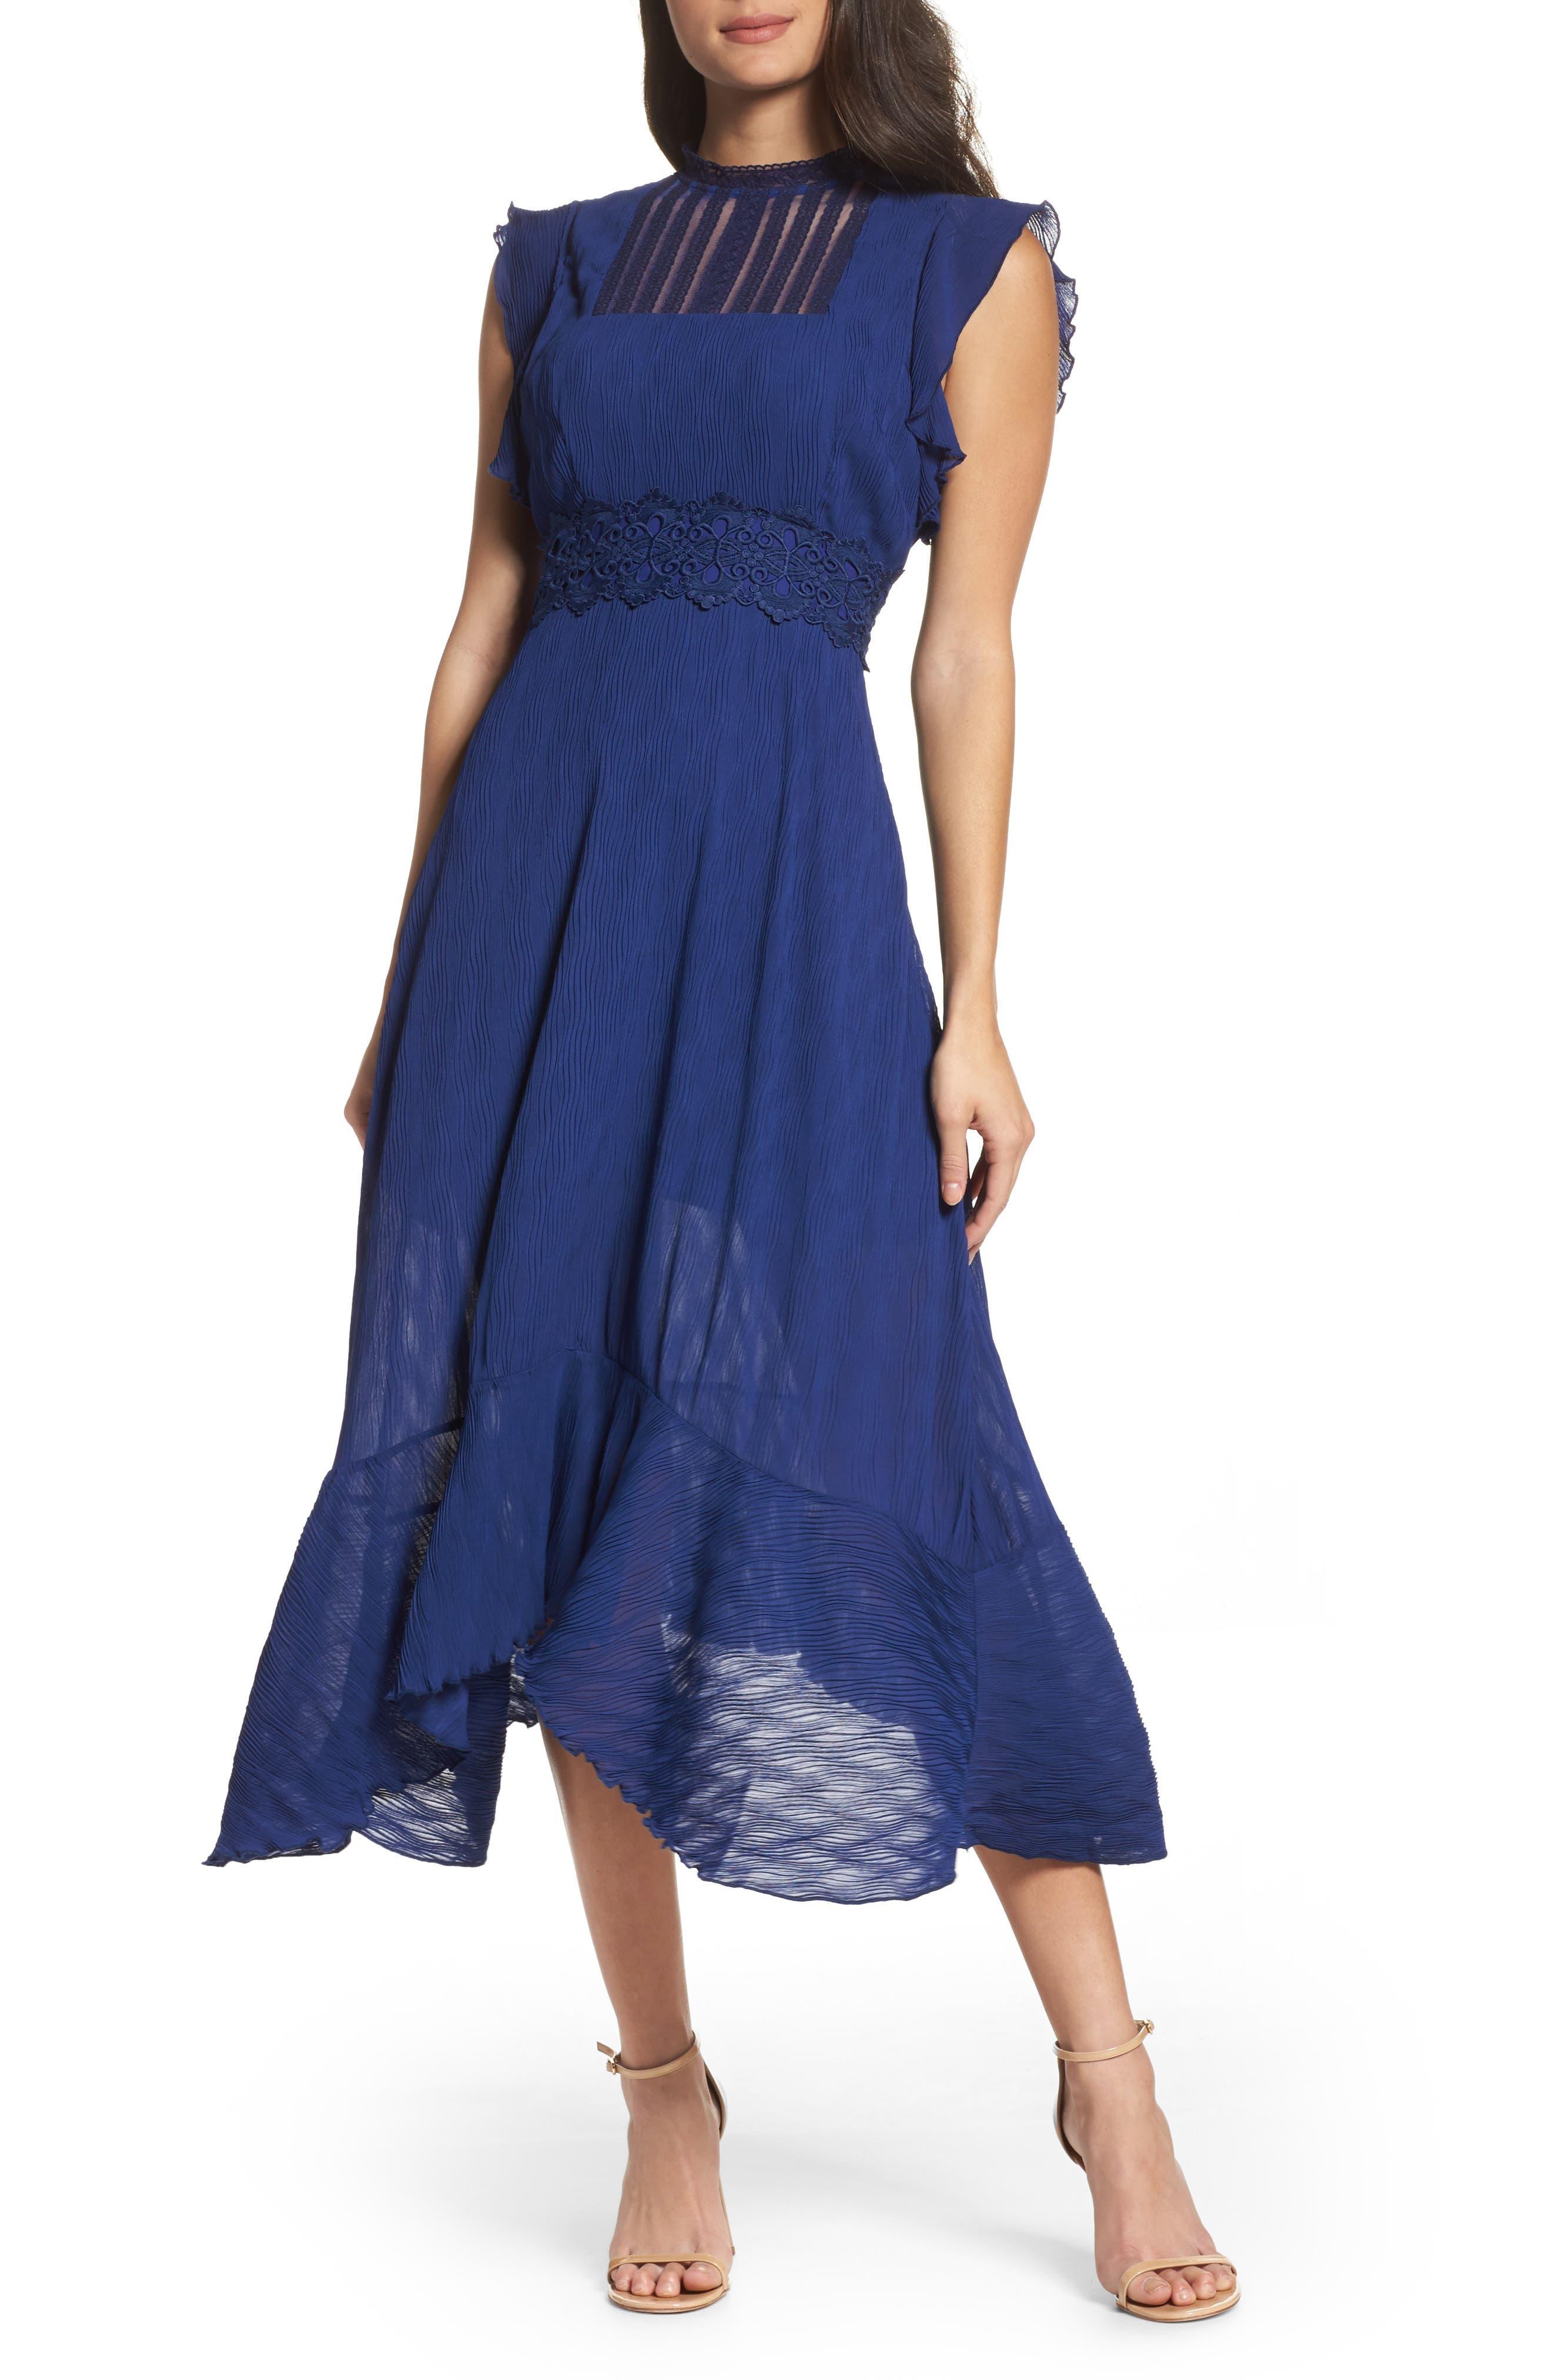 Alternate Image 1 Selected - Foxiedox Isadora Lace Trim Pintuck Midi Dress